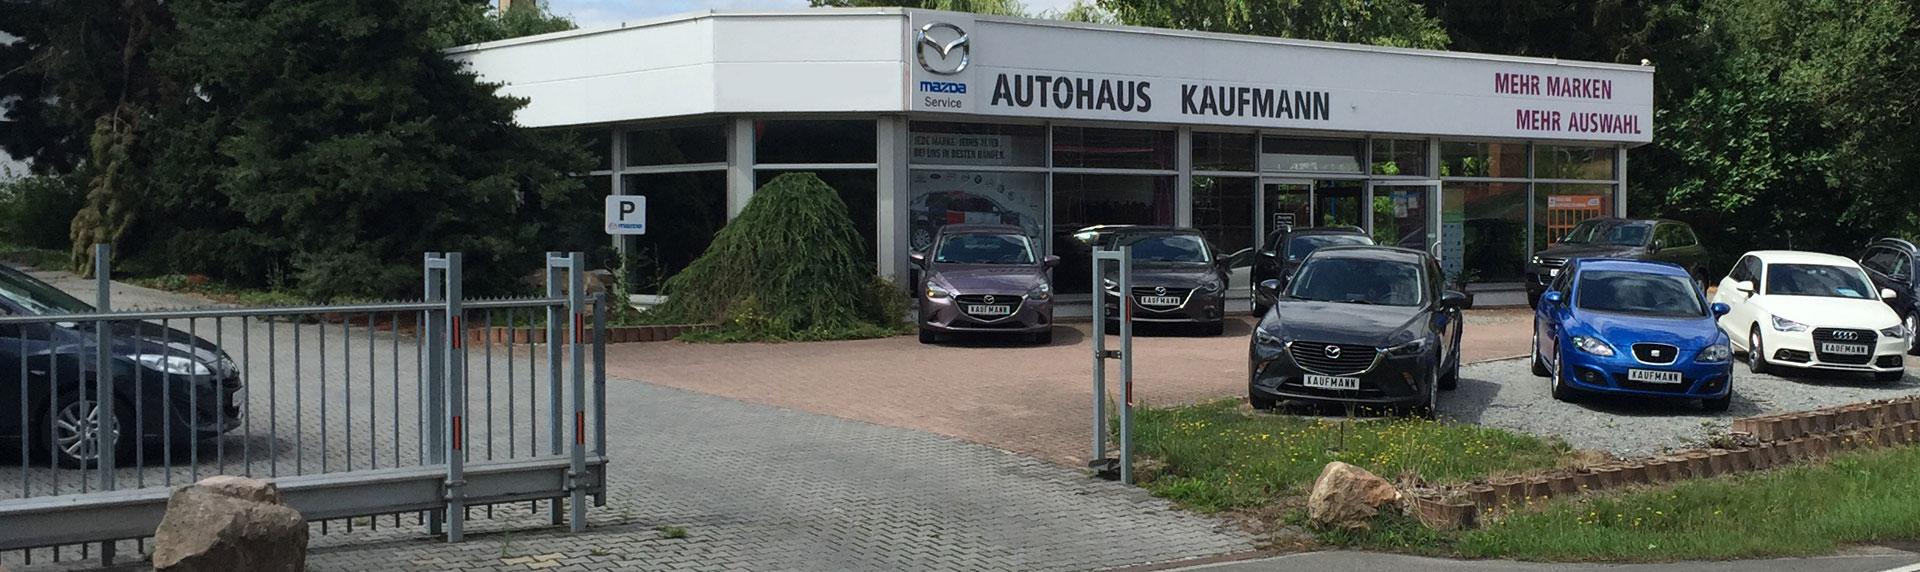 Kontakt zum Autohaus Kaufmann